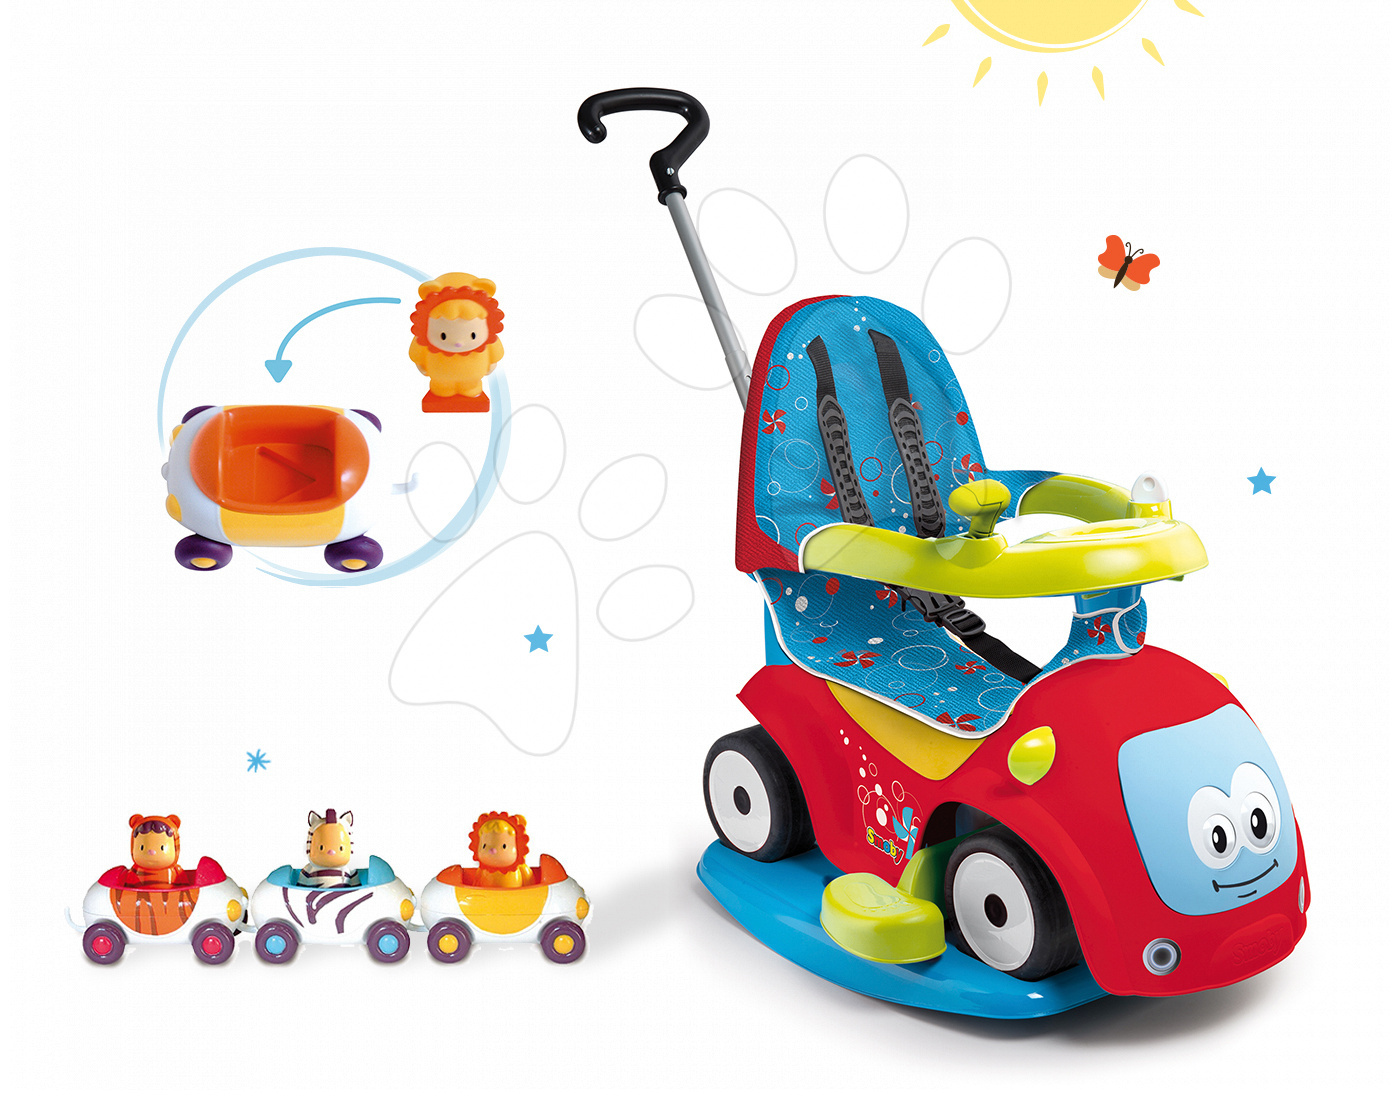 Smoby detské odrážadlo Maestro Confort a autíčka Imagin Car Cotoons 720400-8